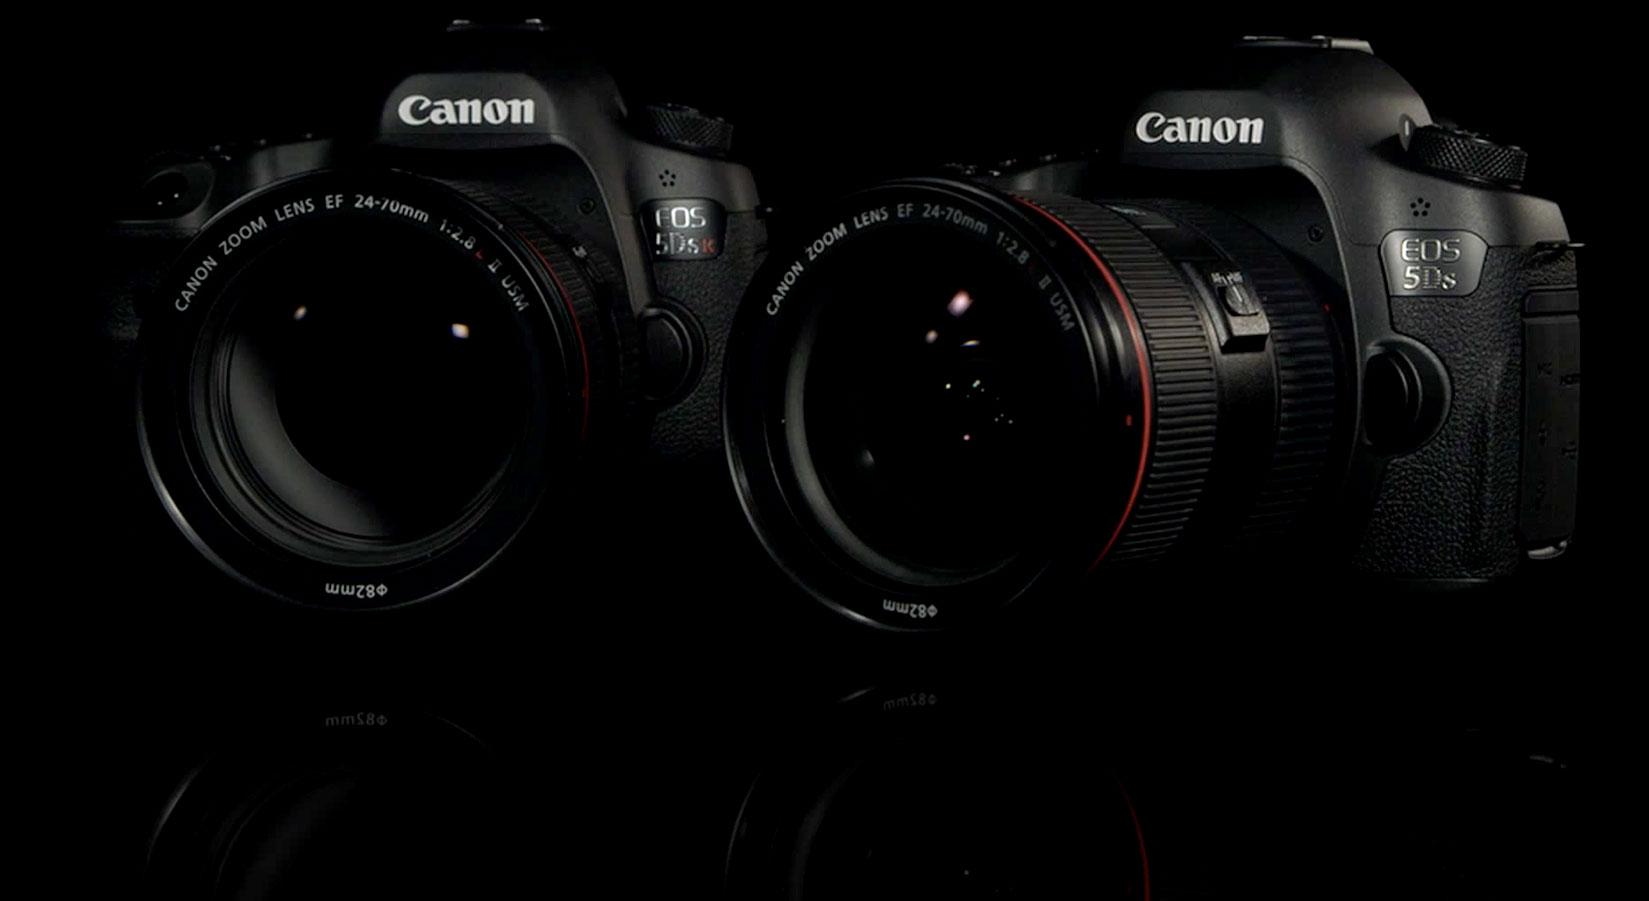 canon_5ds_5dsr